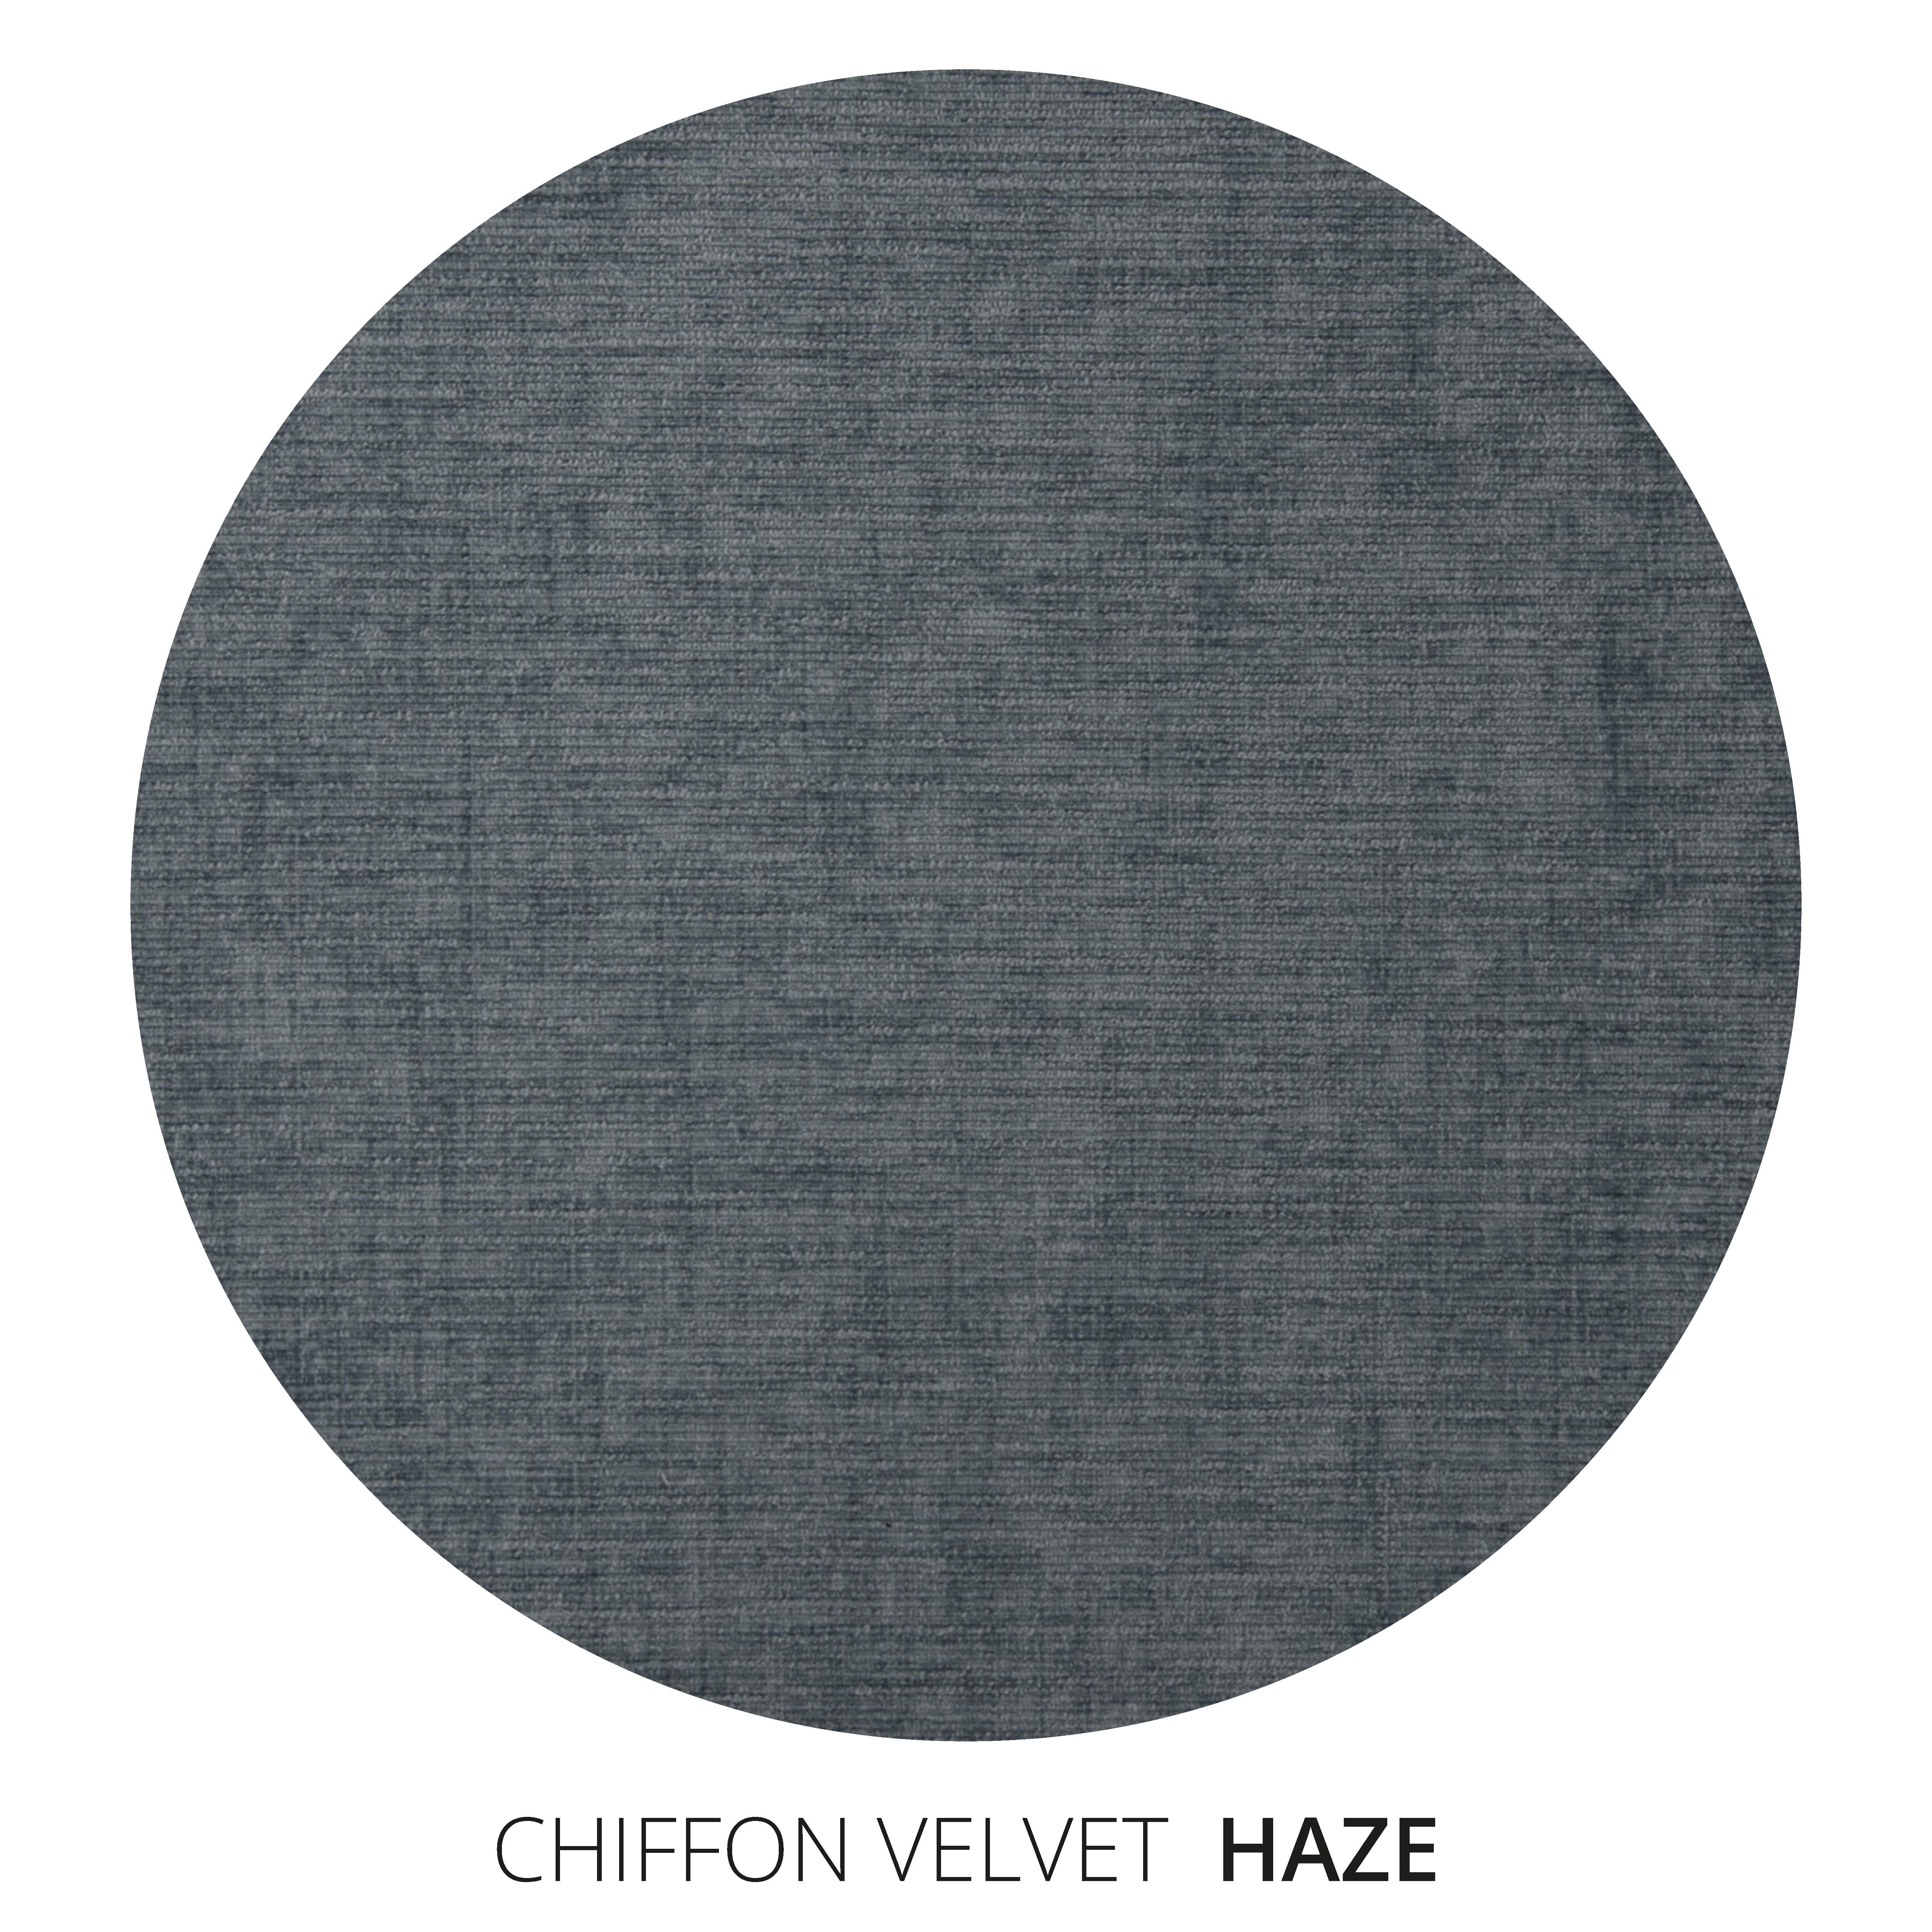 Haze Chiffon Velvet Swatch